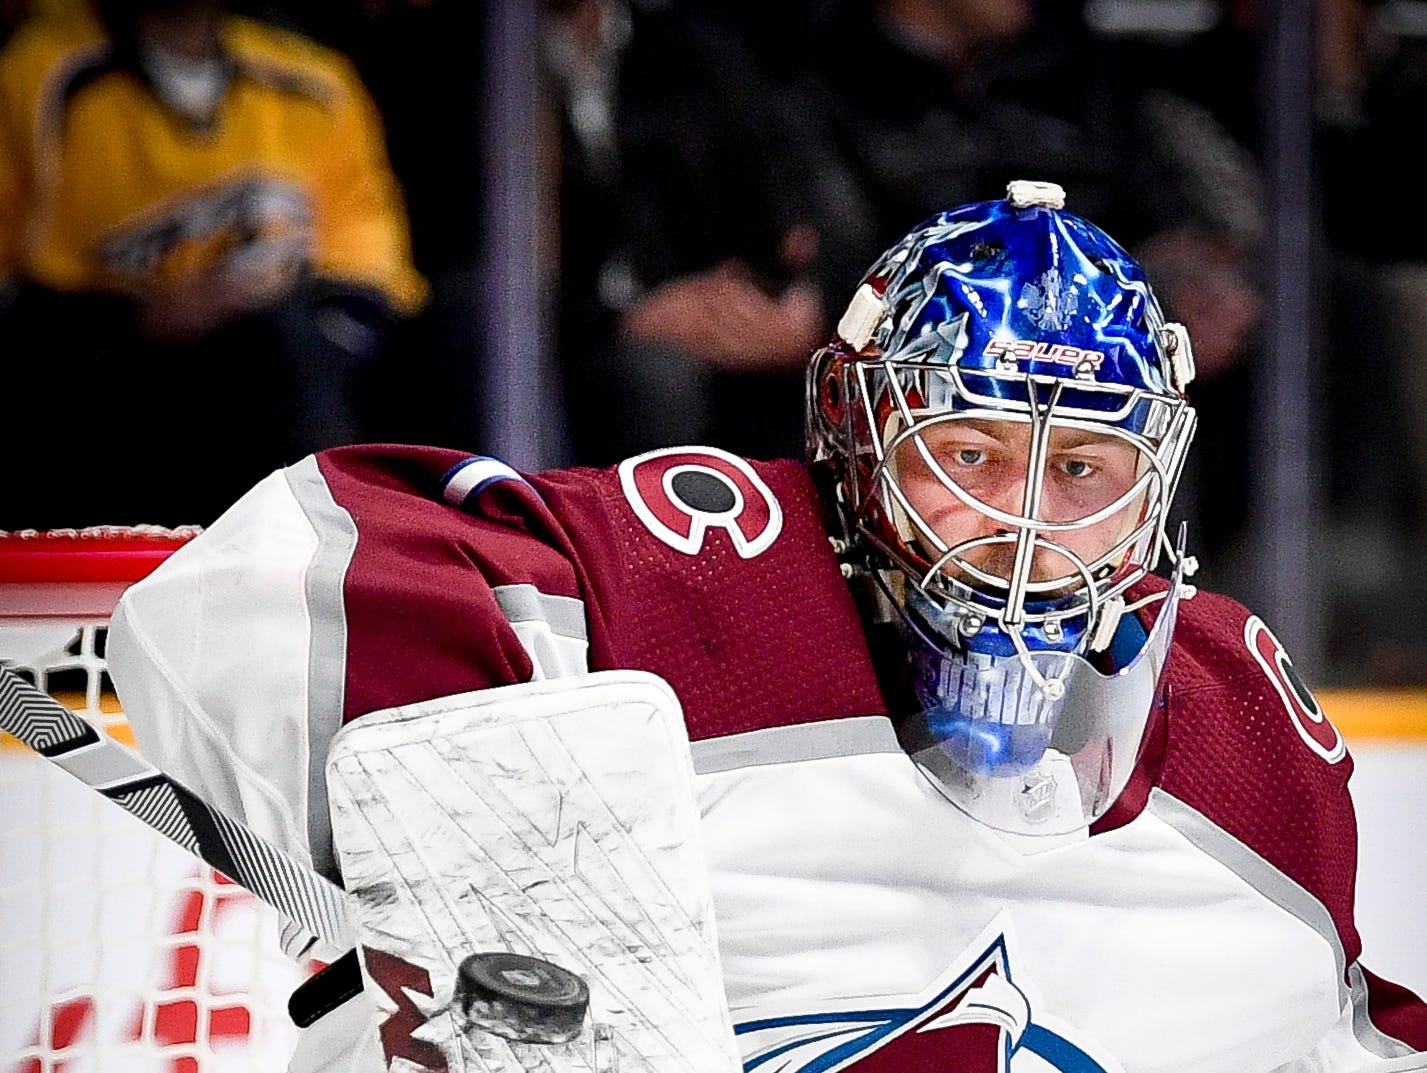 Colorado Avalanche goaltender Semyon Varlamov (1) blocks a Nashville Predators shot during the first period at Bridgestone Arena in Nashville, Tenn., Tuesday, Nov. 27, 2018.